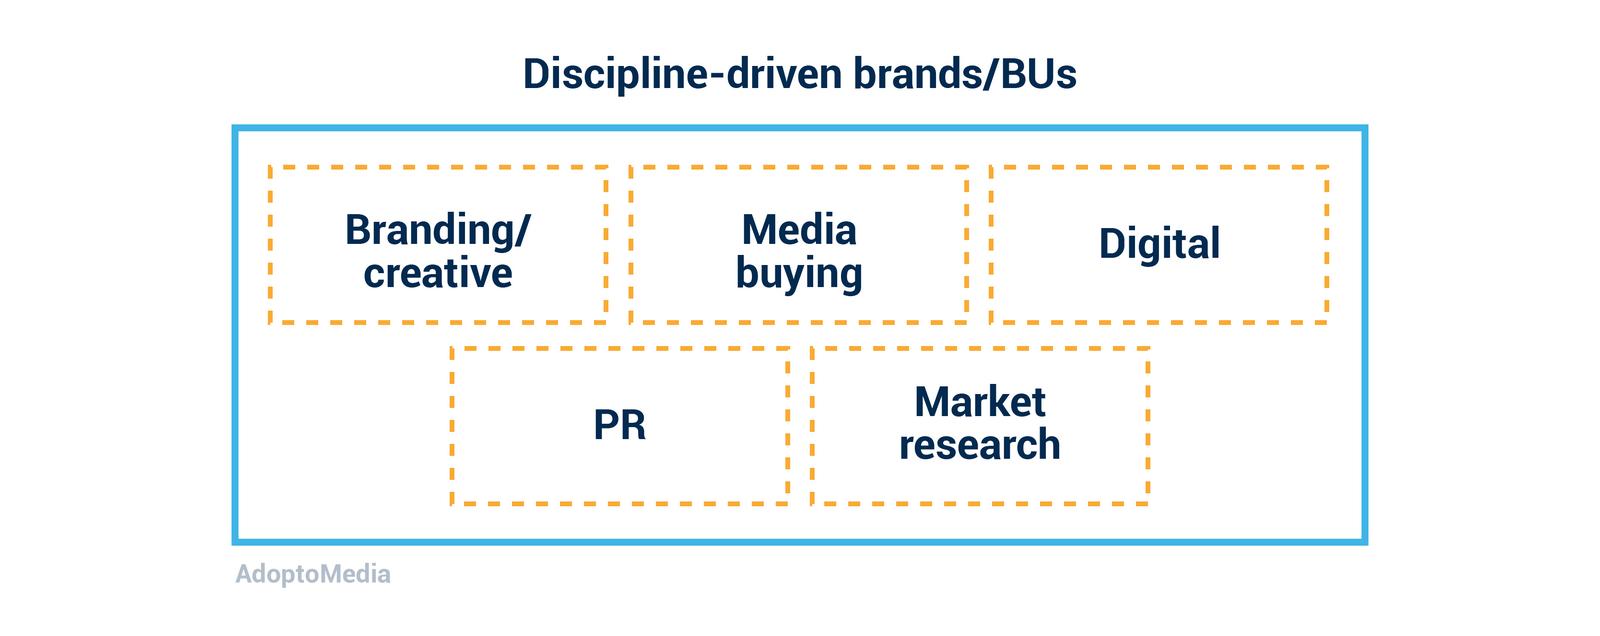 agency model, integration, branding, creative, media-buying, digital, market research